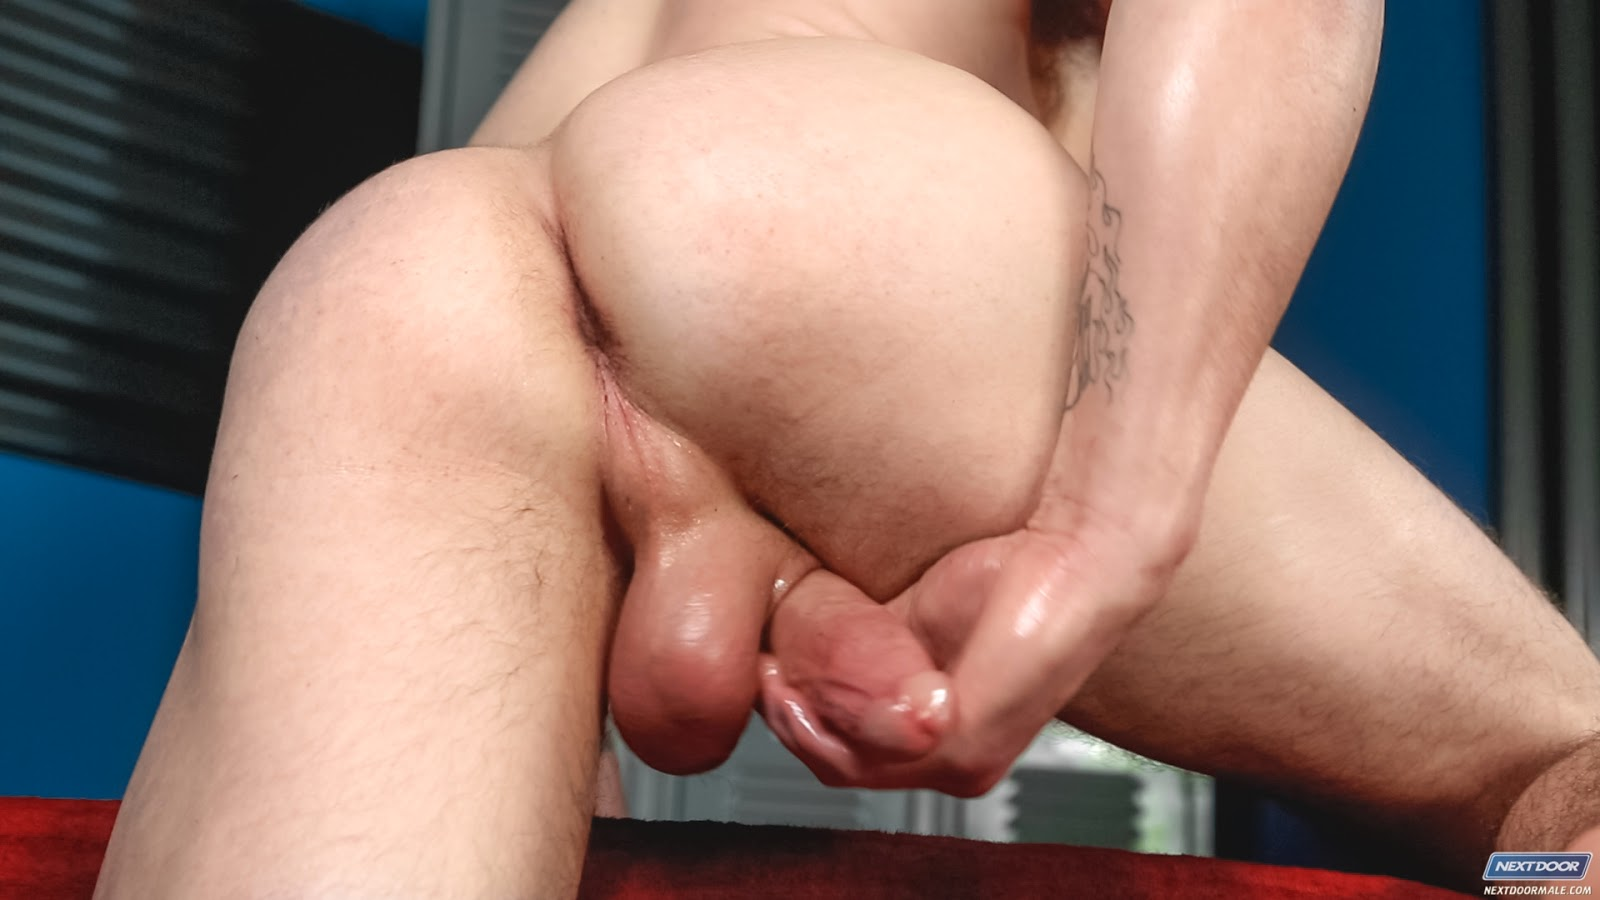 http://juicygayporn.com/category/next-door-male